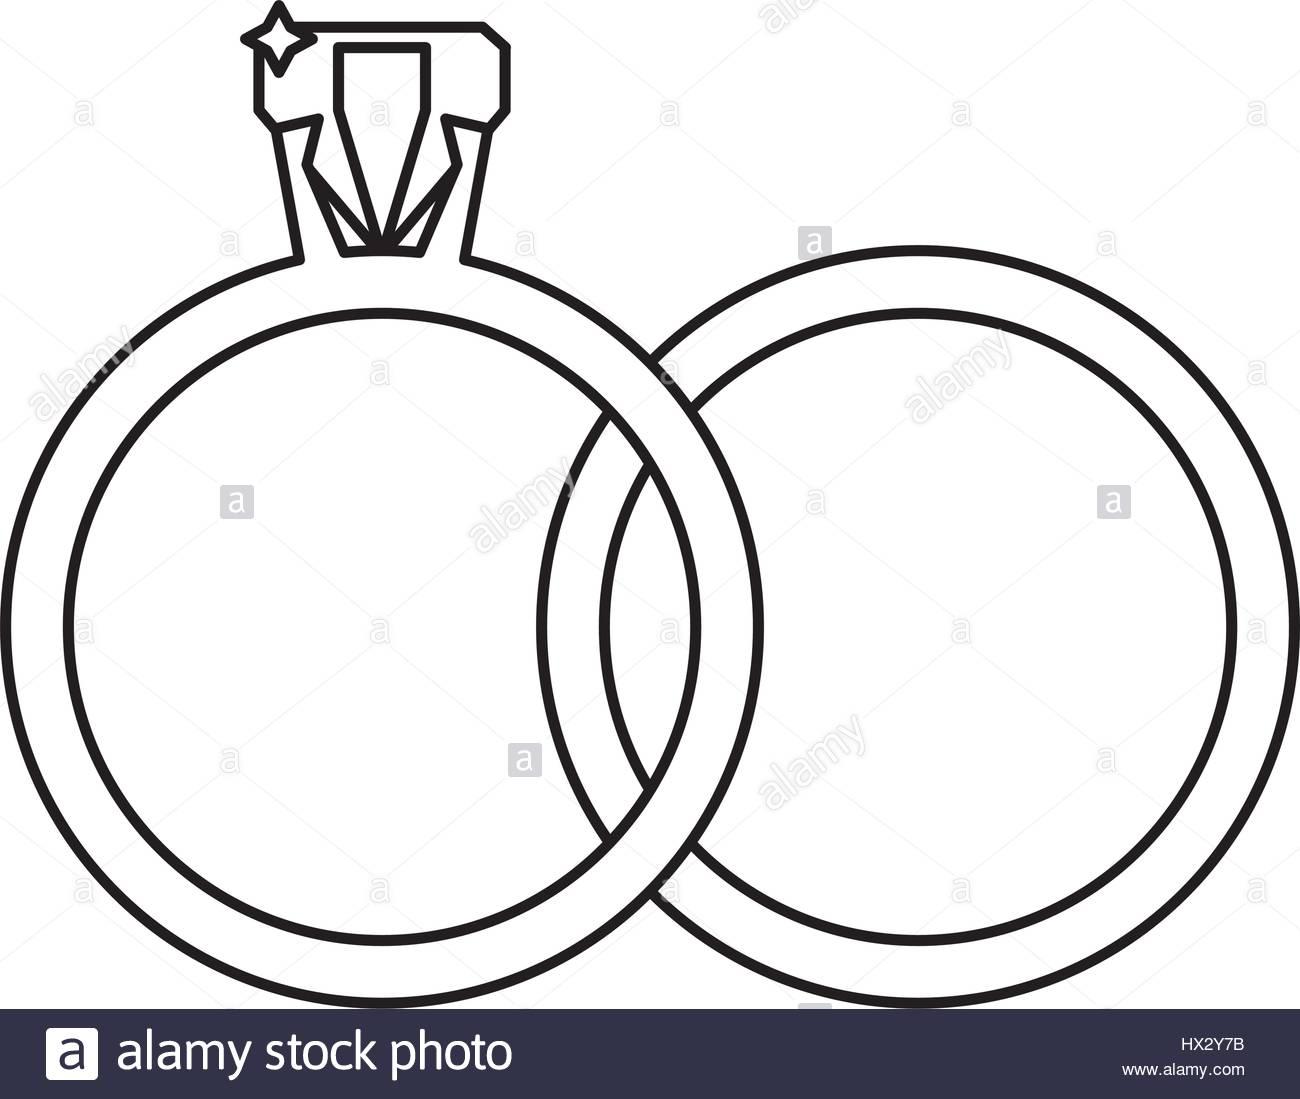 1300x1099 Wedding Rings Jewelry Outline Stock Vector Art Amp Illustration